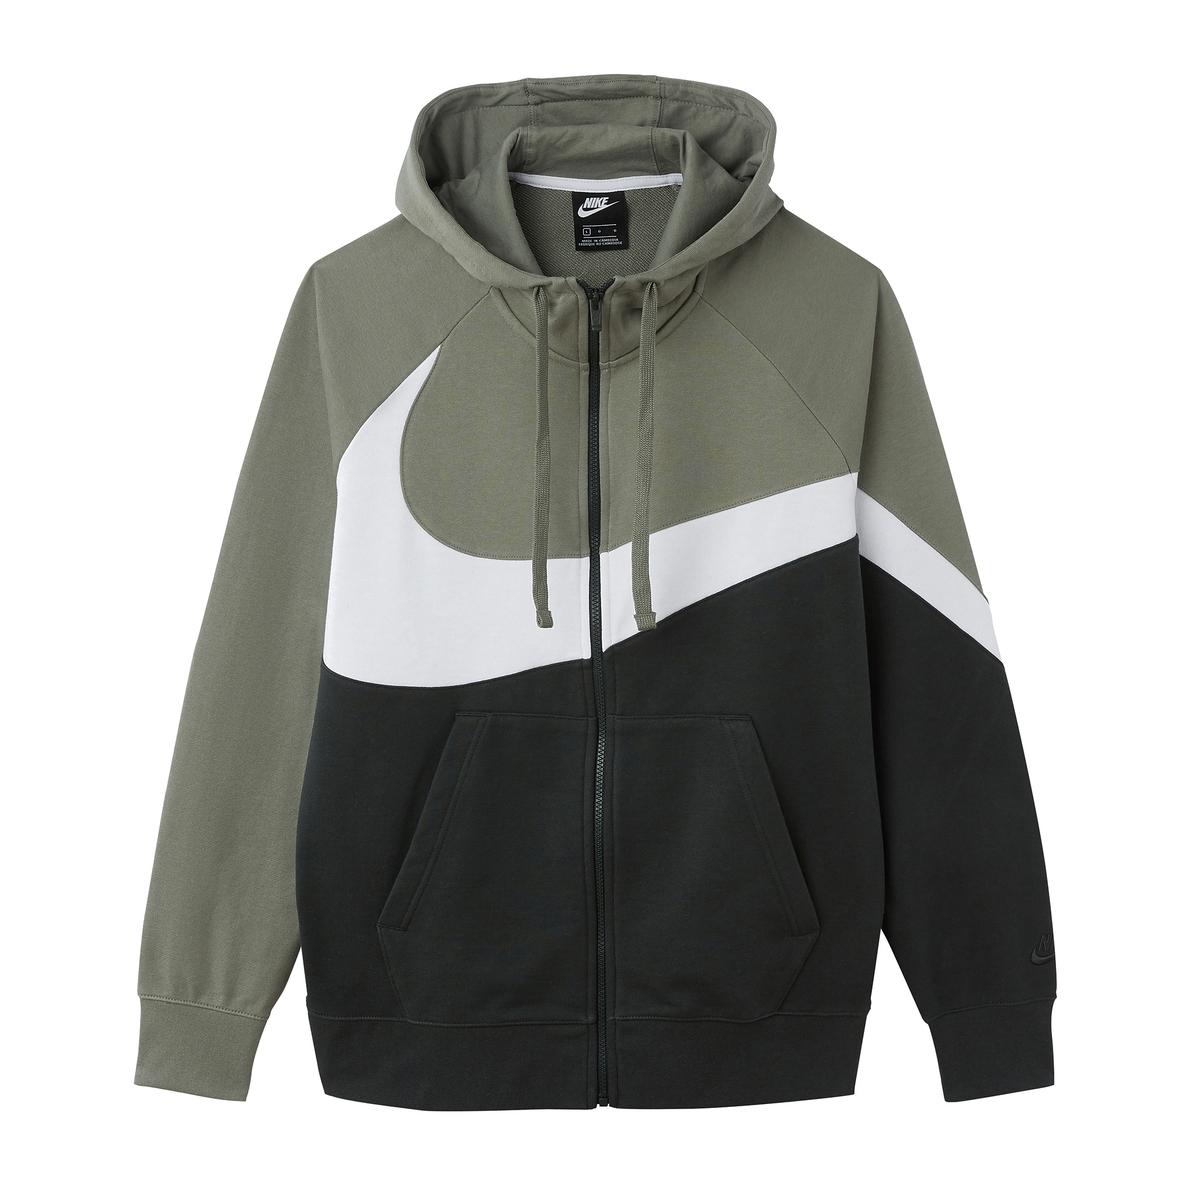 Sudadera con cremallera y capucha Nike Sportswear